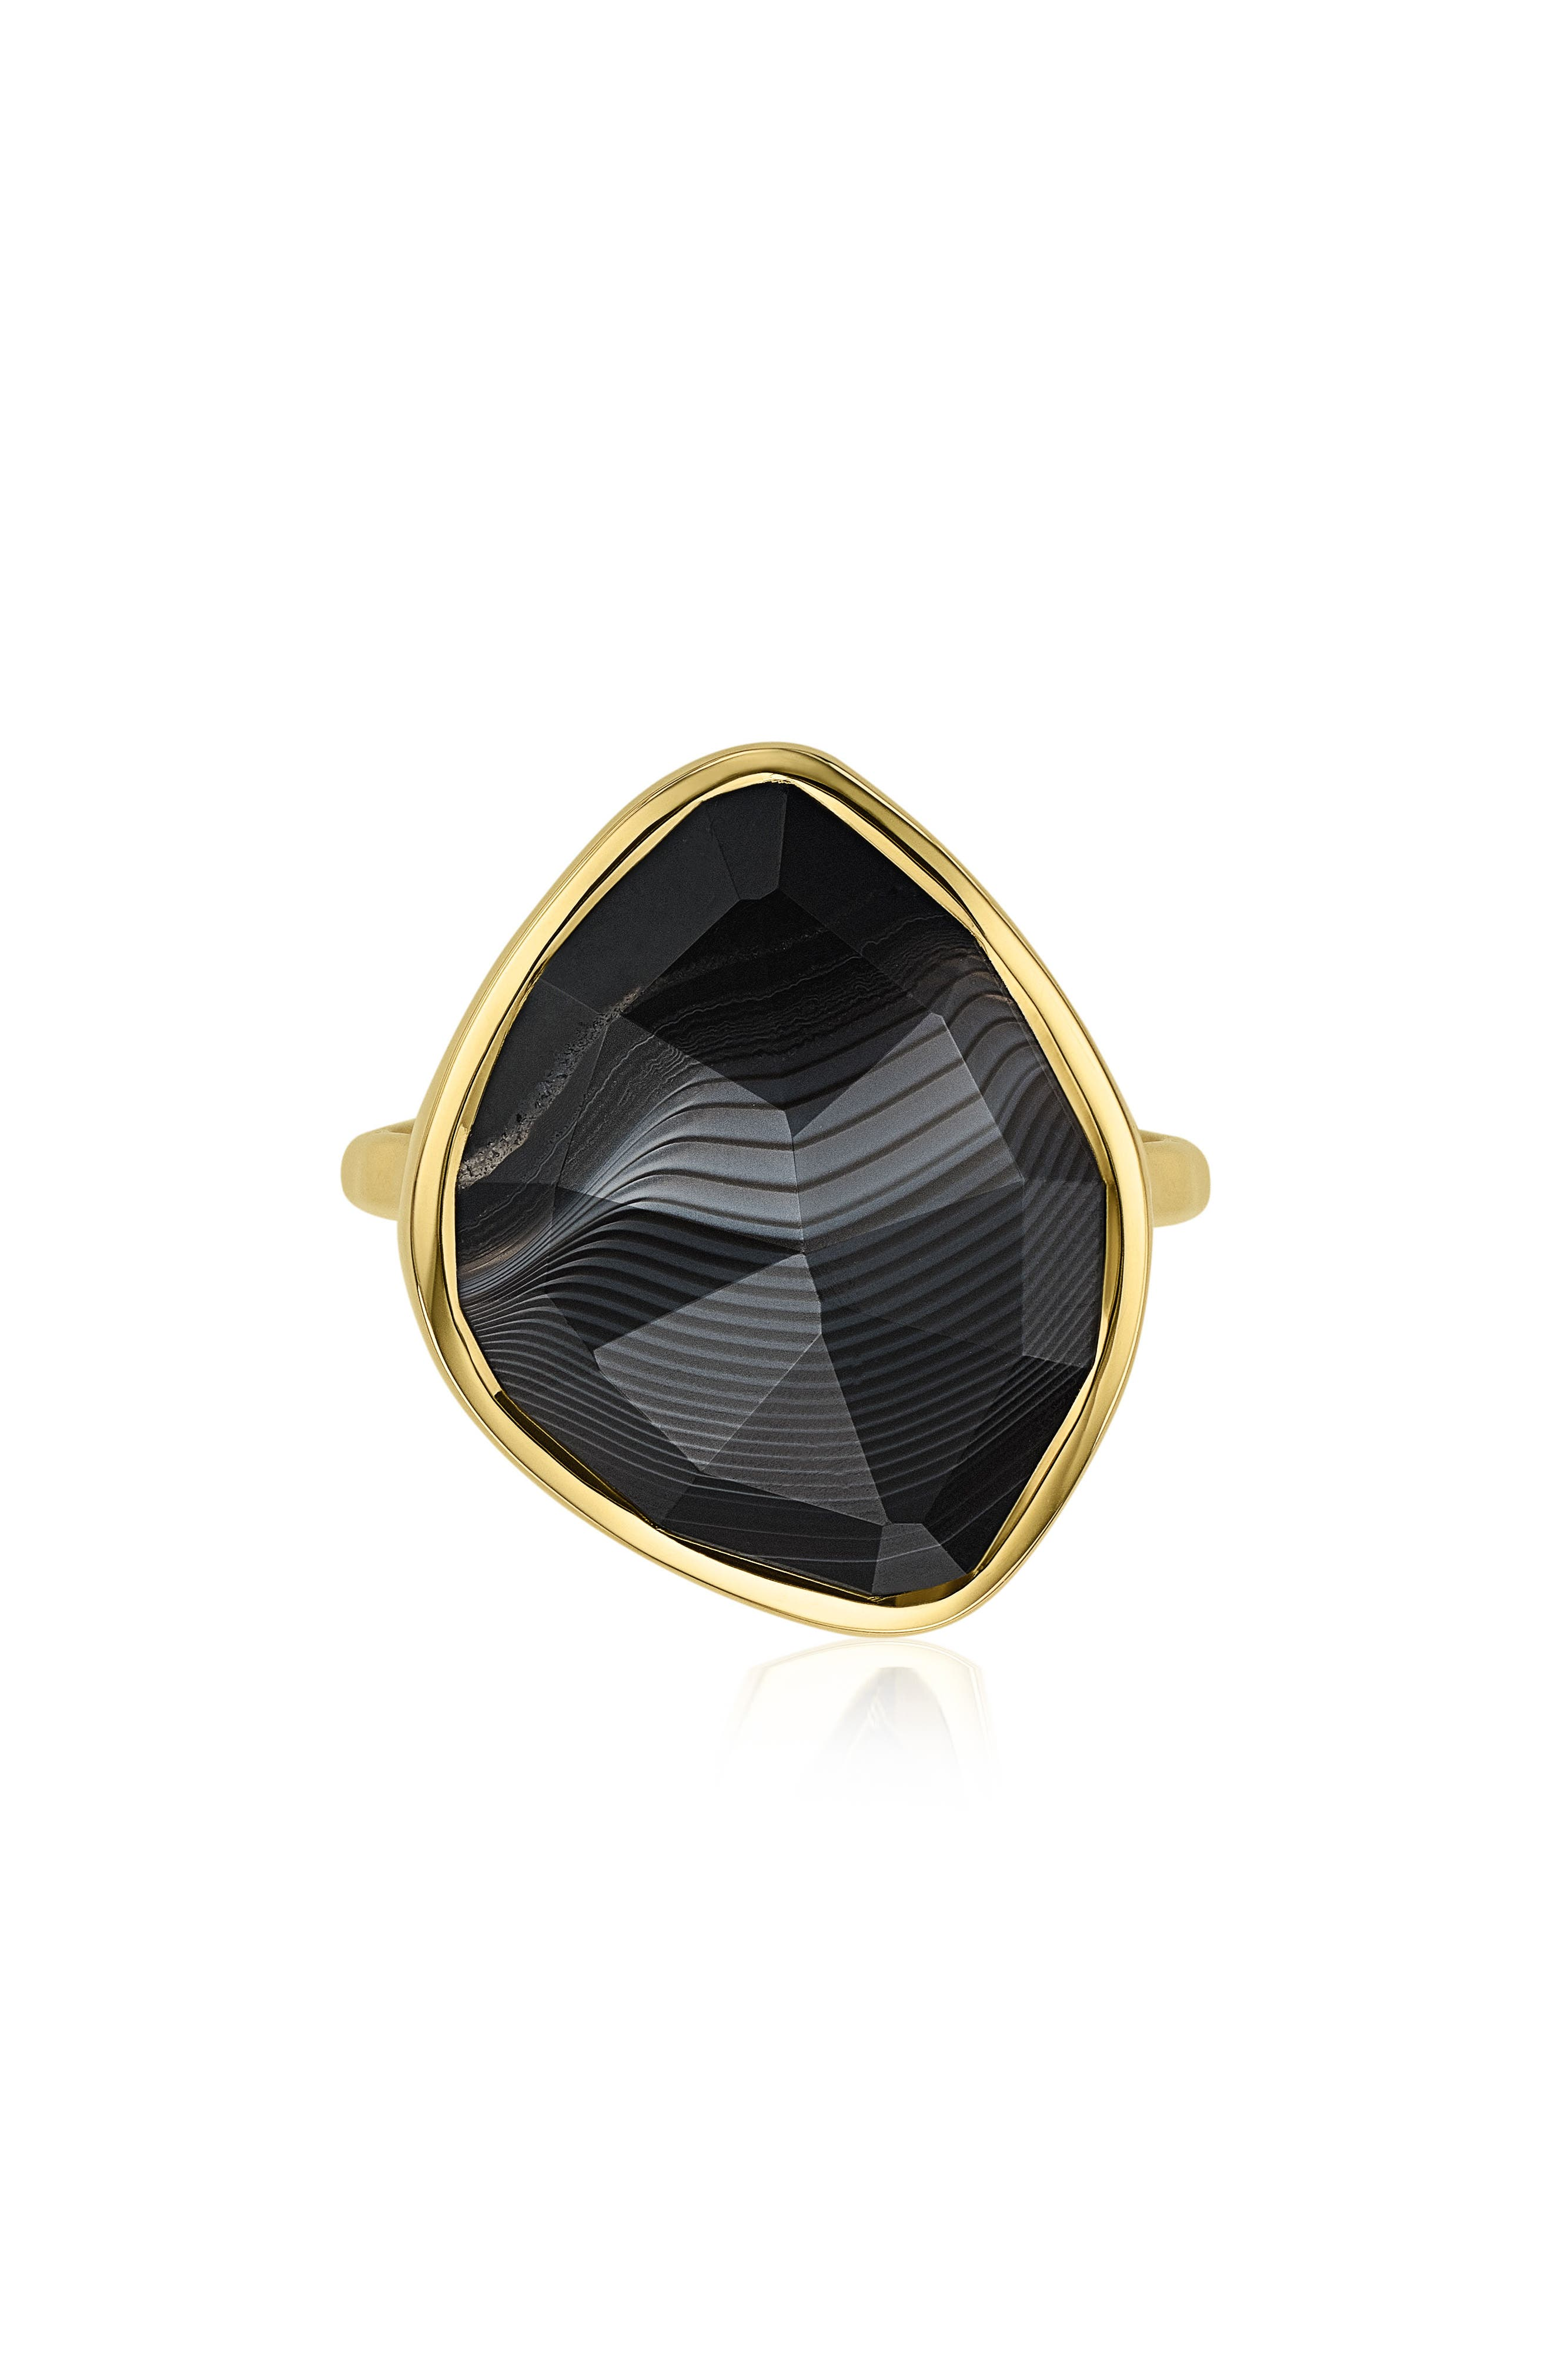 Siren Nugget Semiprecious Stone Ring,                             Main thumbnail 1, color,                             BLACK LINE ONYX/ YELLOW GOLD